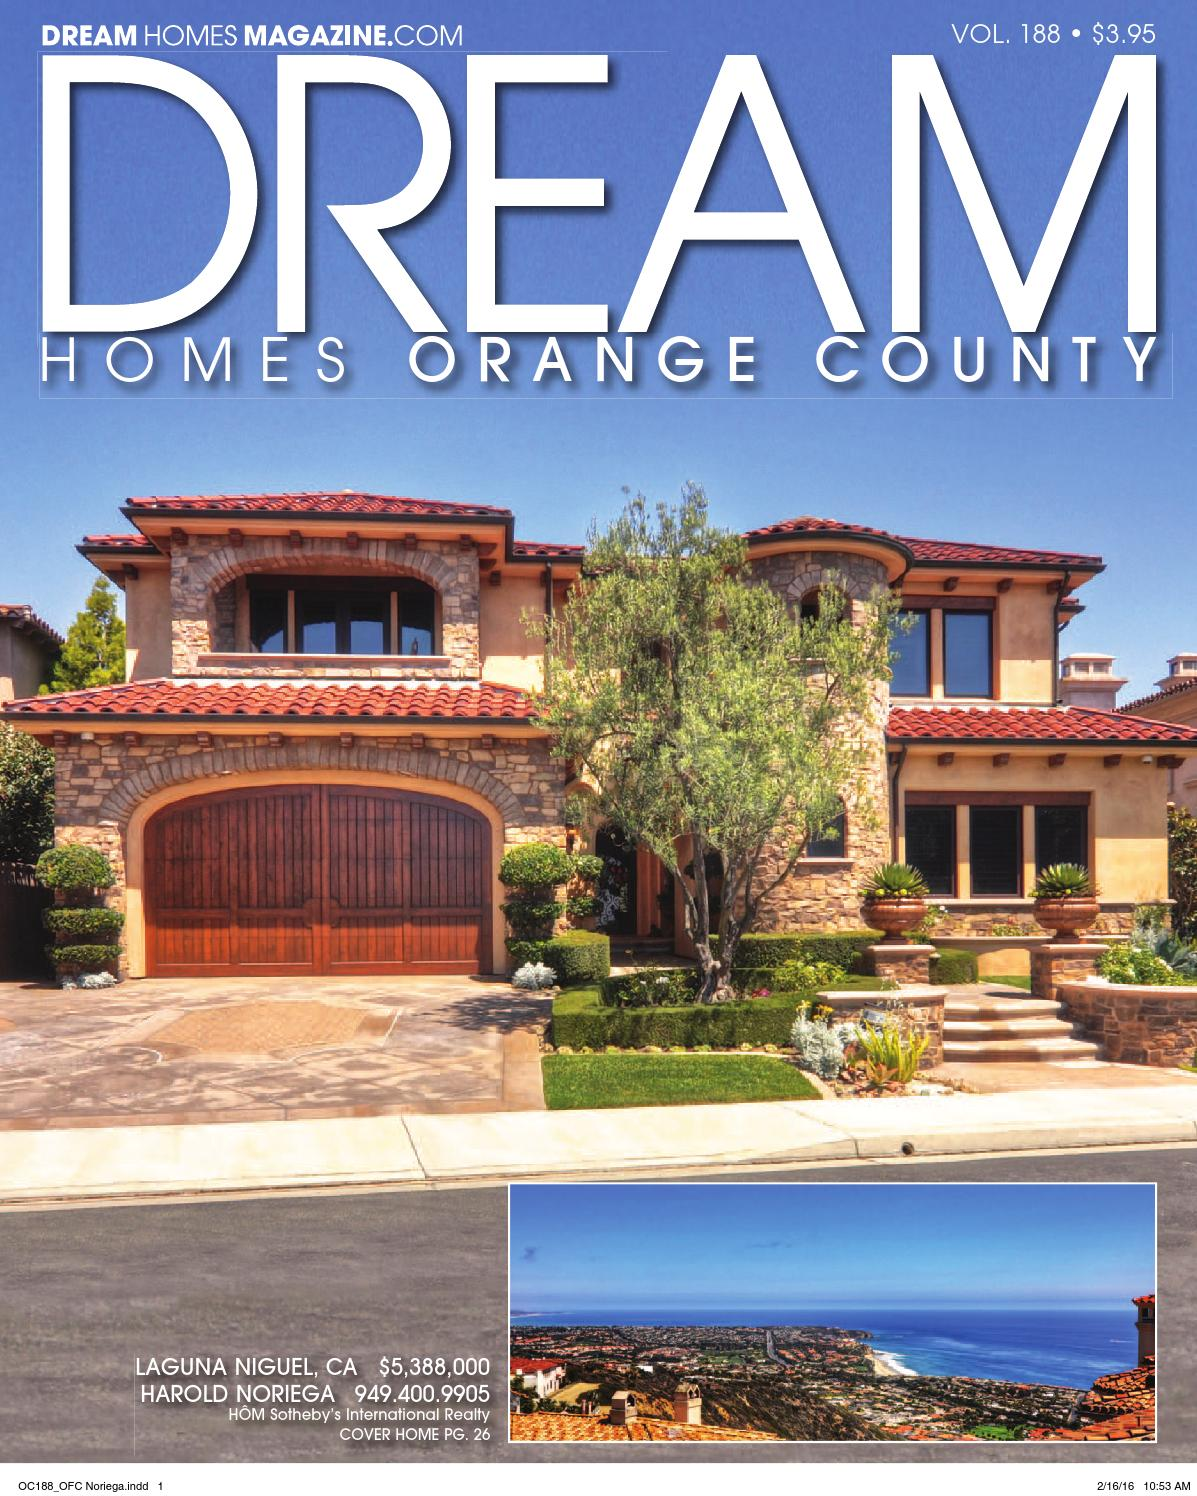 Dream Homes Magazine By Emerald Bay Real Estate | Harold Noriega   Issuu